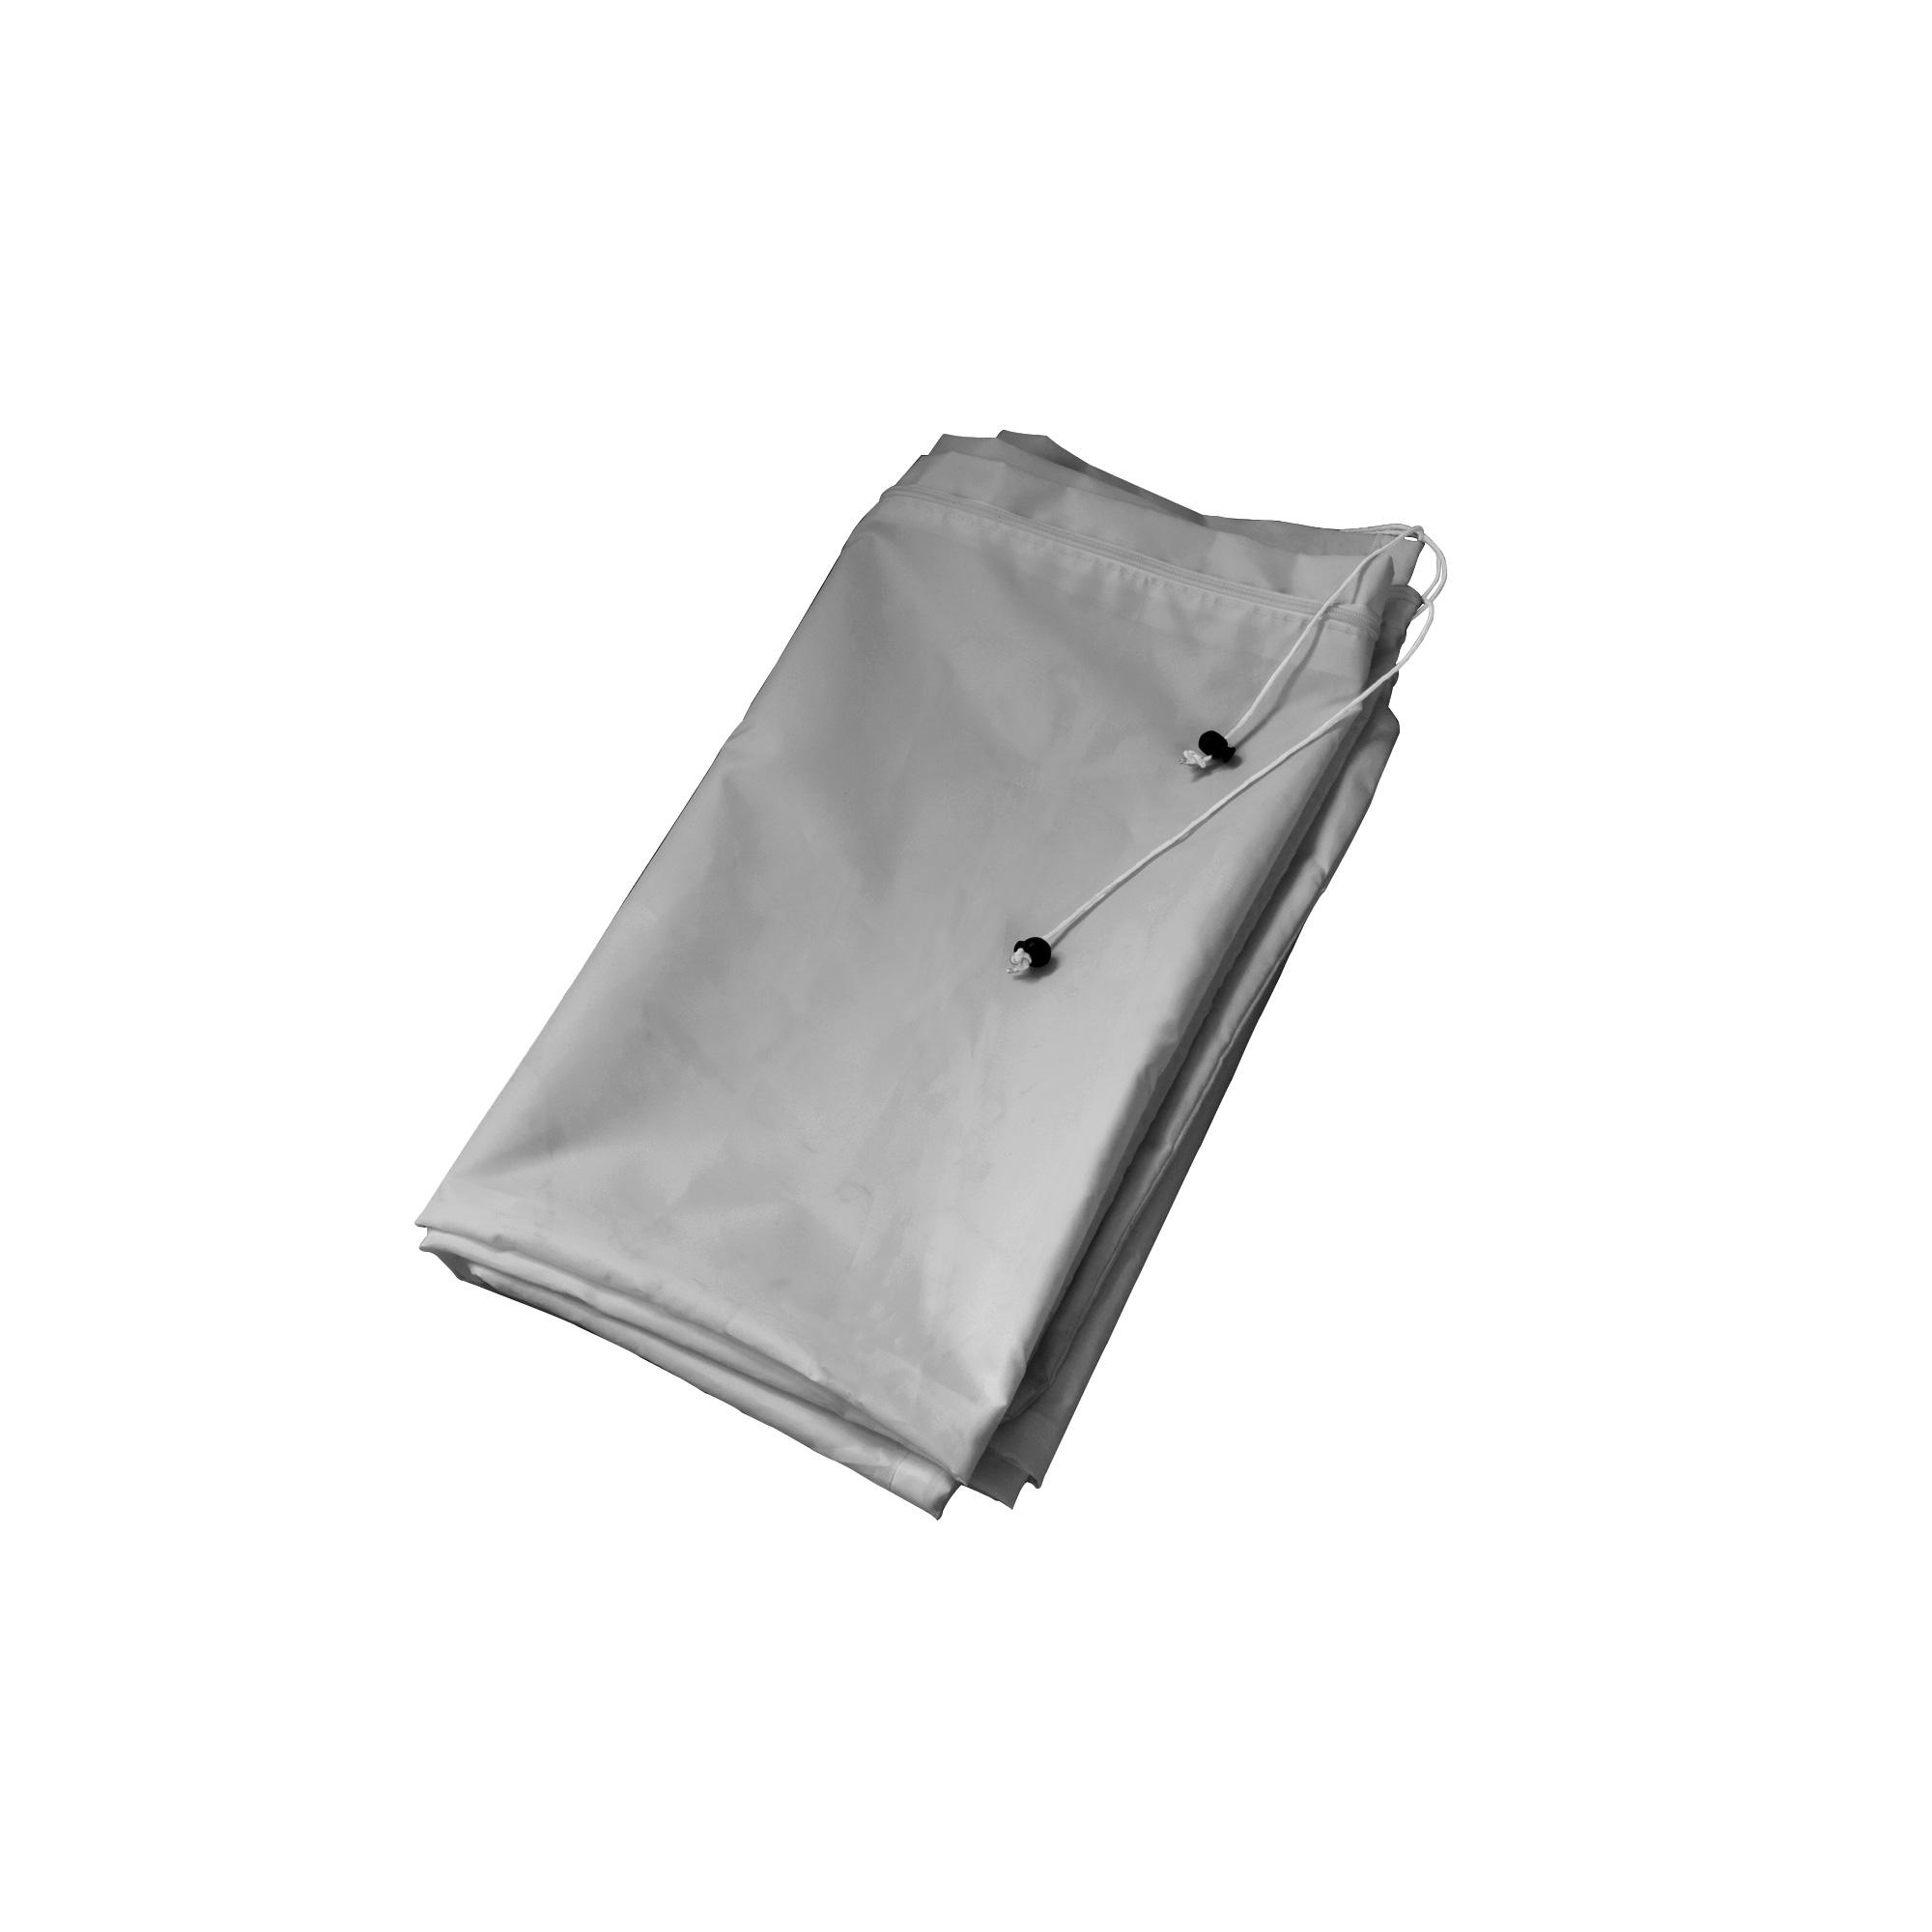 Schutzhülle Sonnenschirm Abdeckung Sonnenschirmhülle Hülle Regenschutz B-Ware